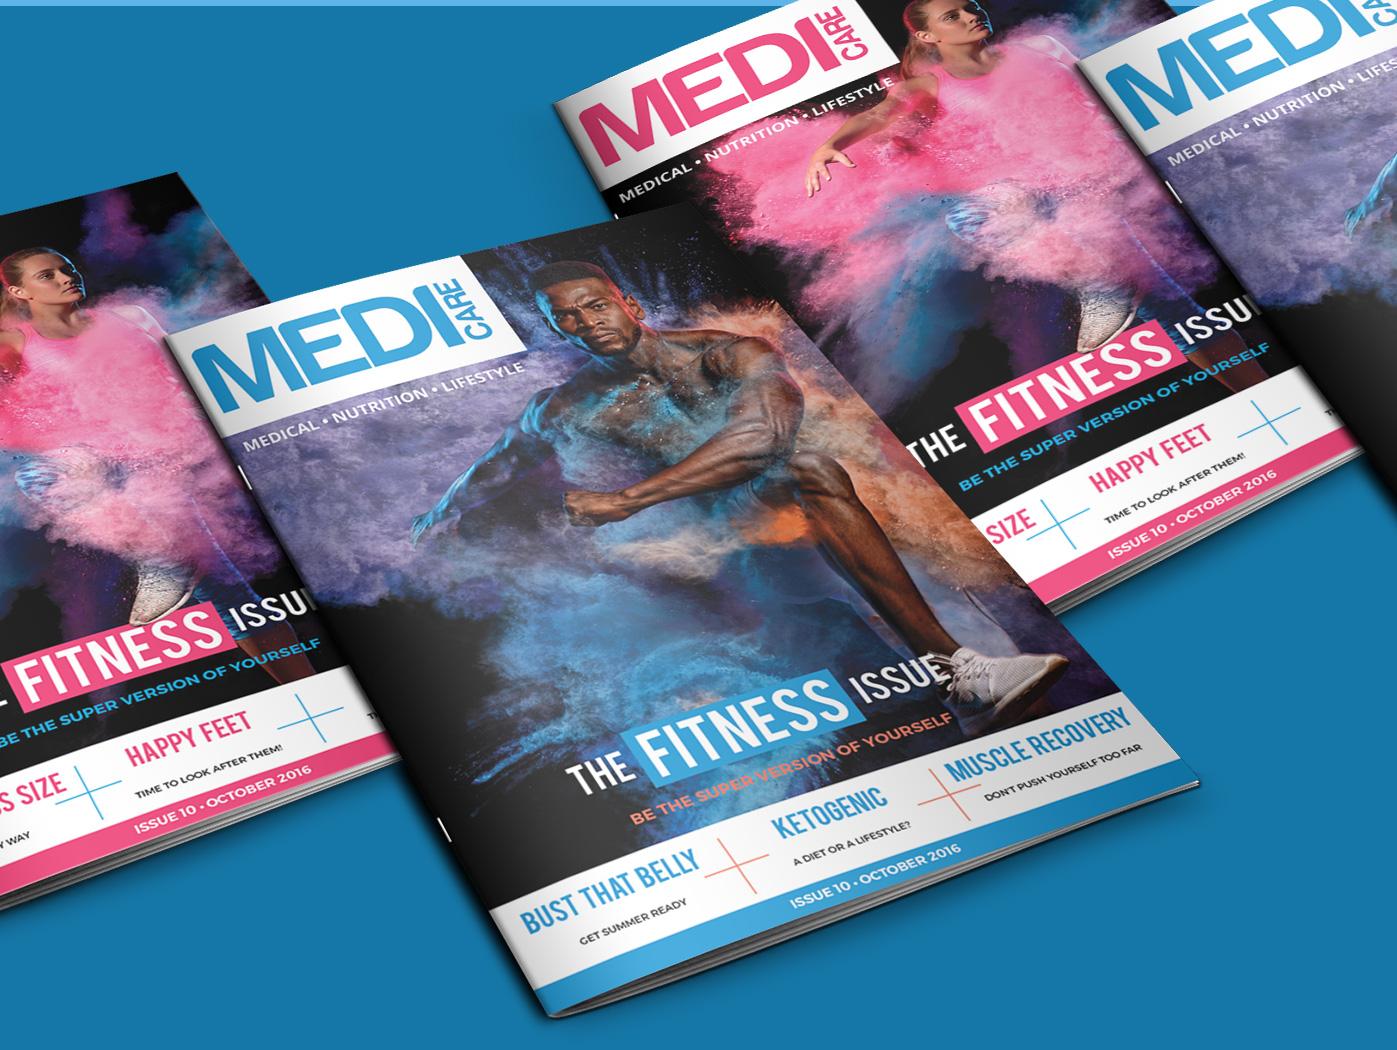 Medicare | Magazine Designs Graphic Design by Agent Orange South Africa